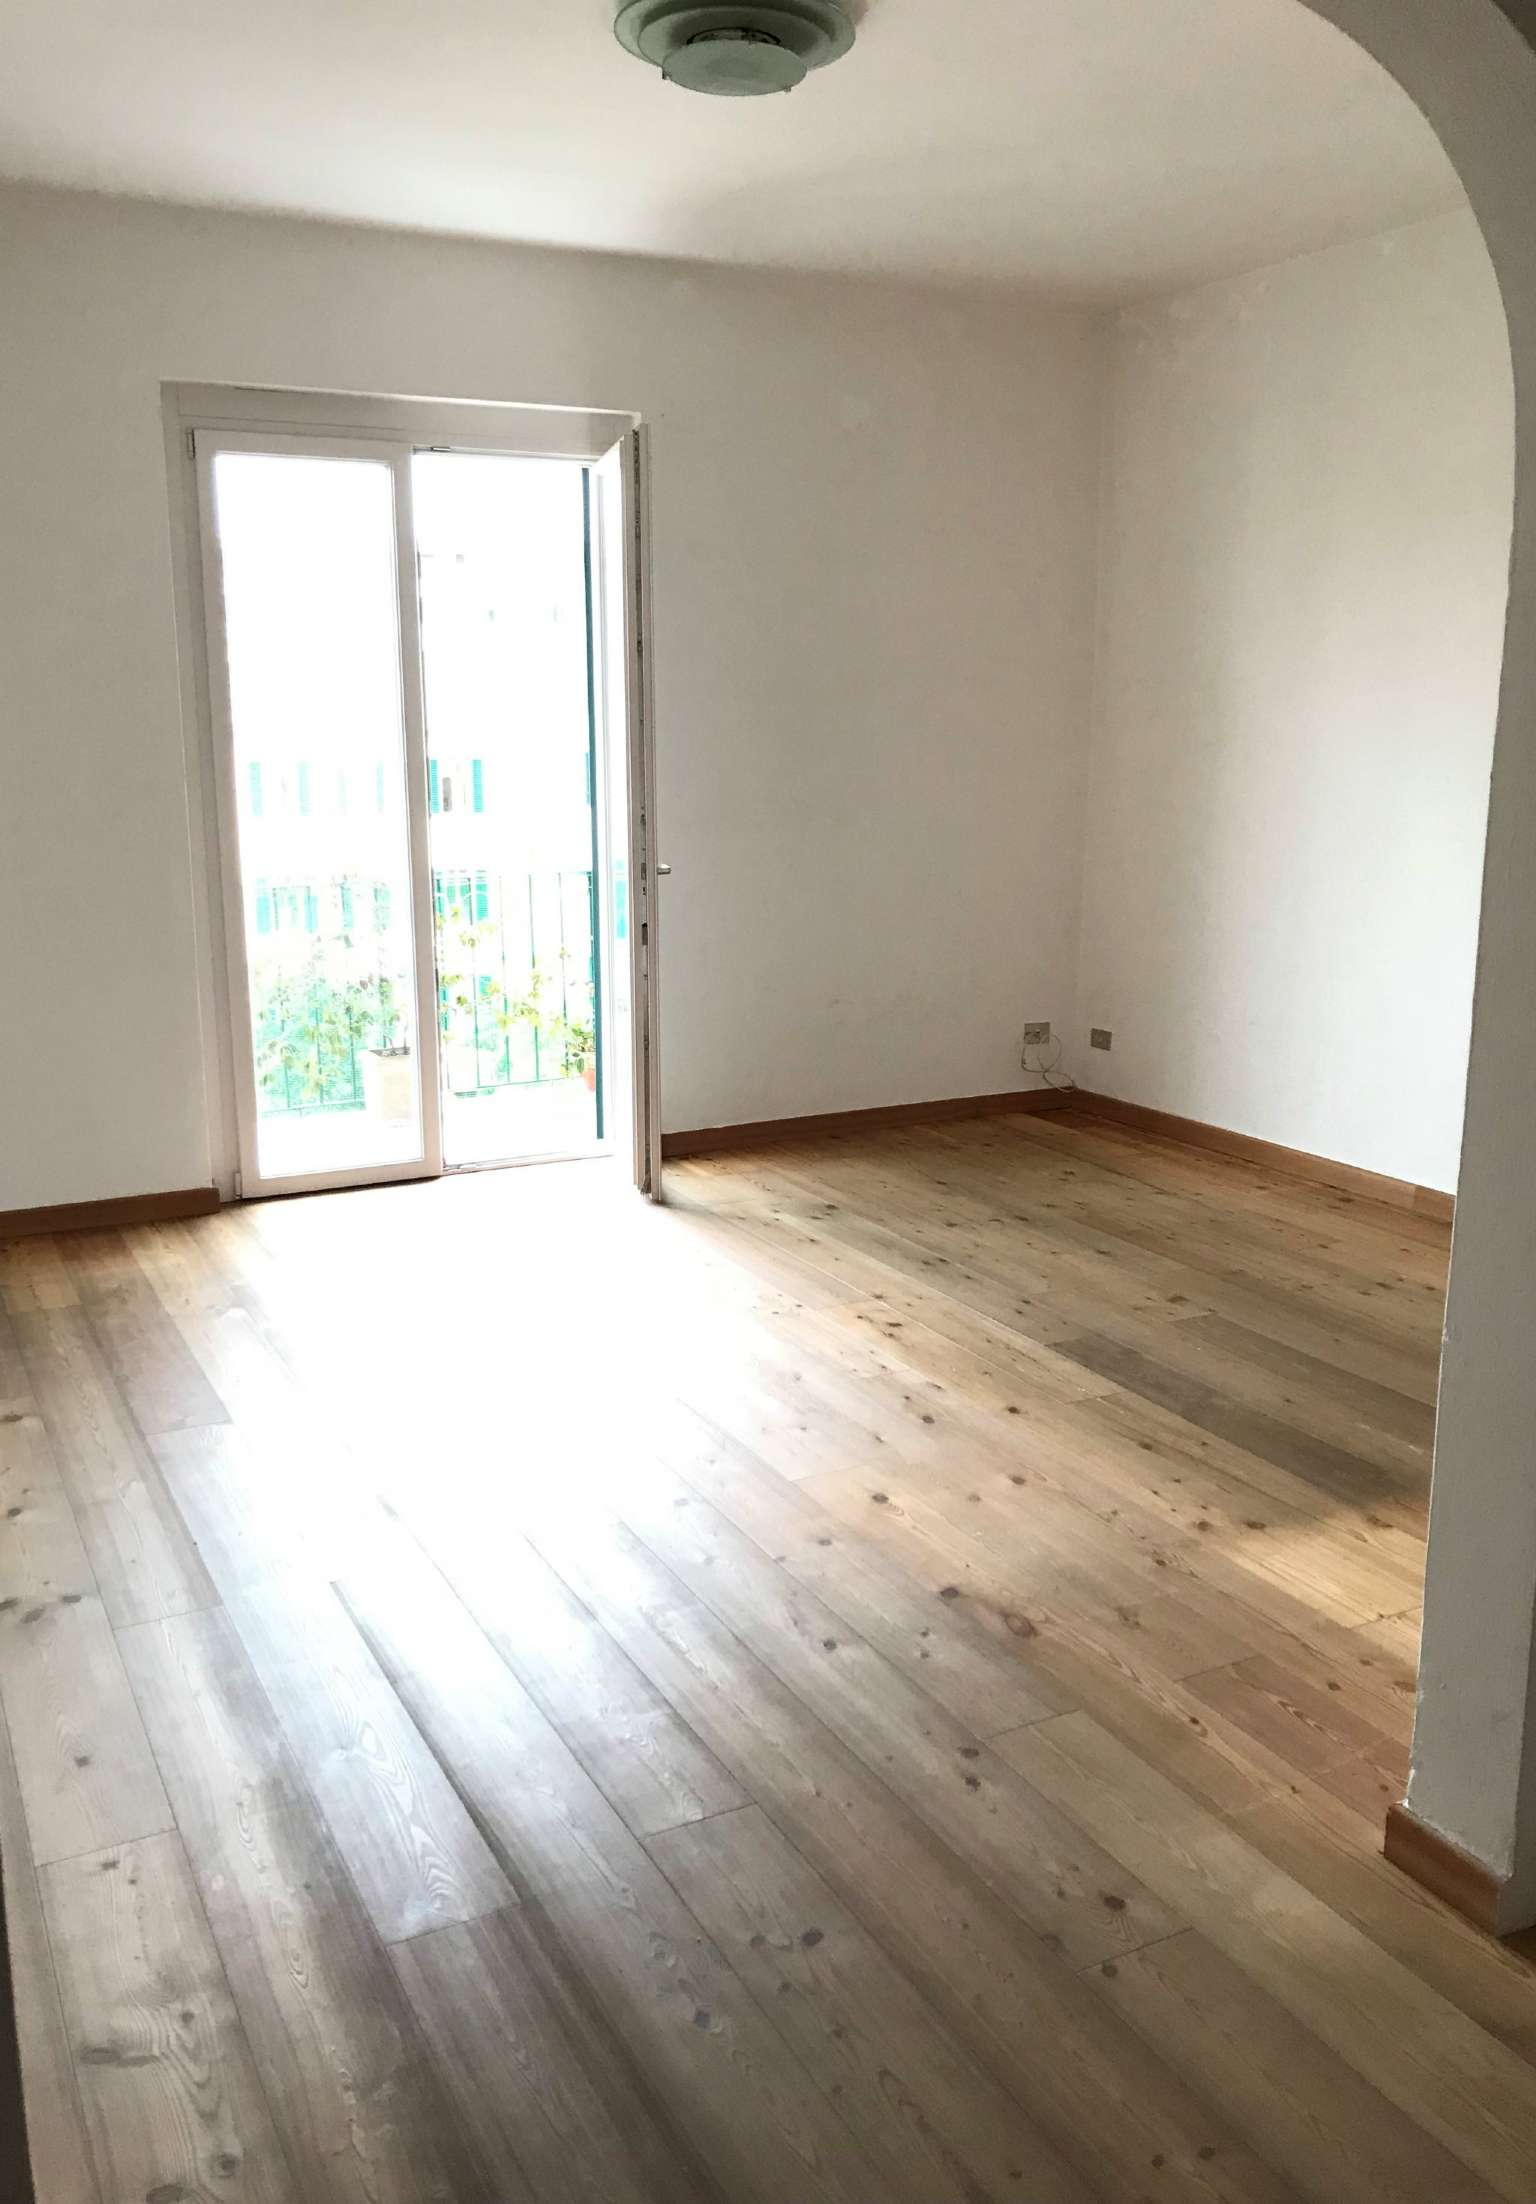 Appartamento in Vendita a Firenze Periferia Ovest: 5 locali, 150 mq